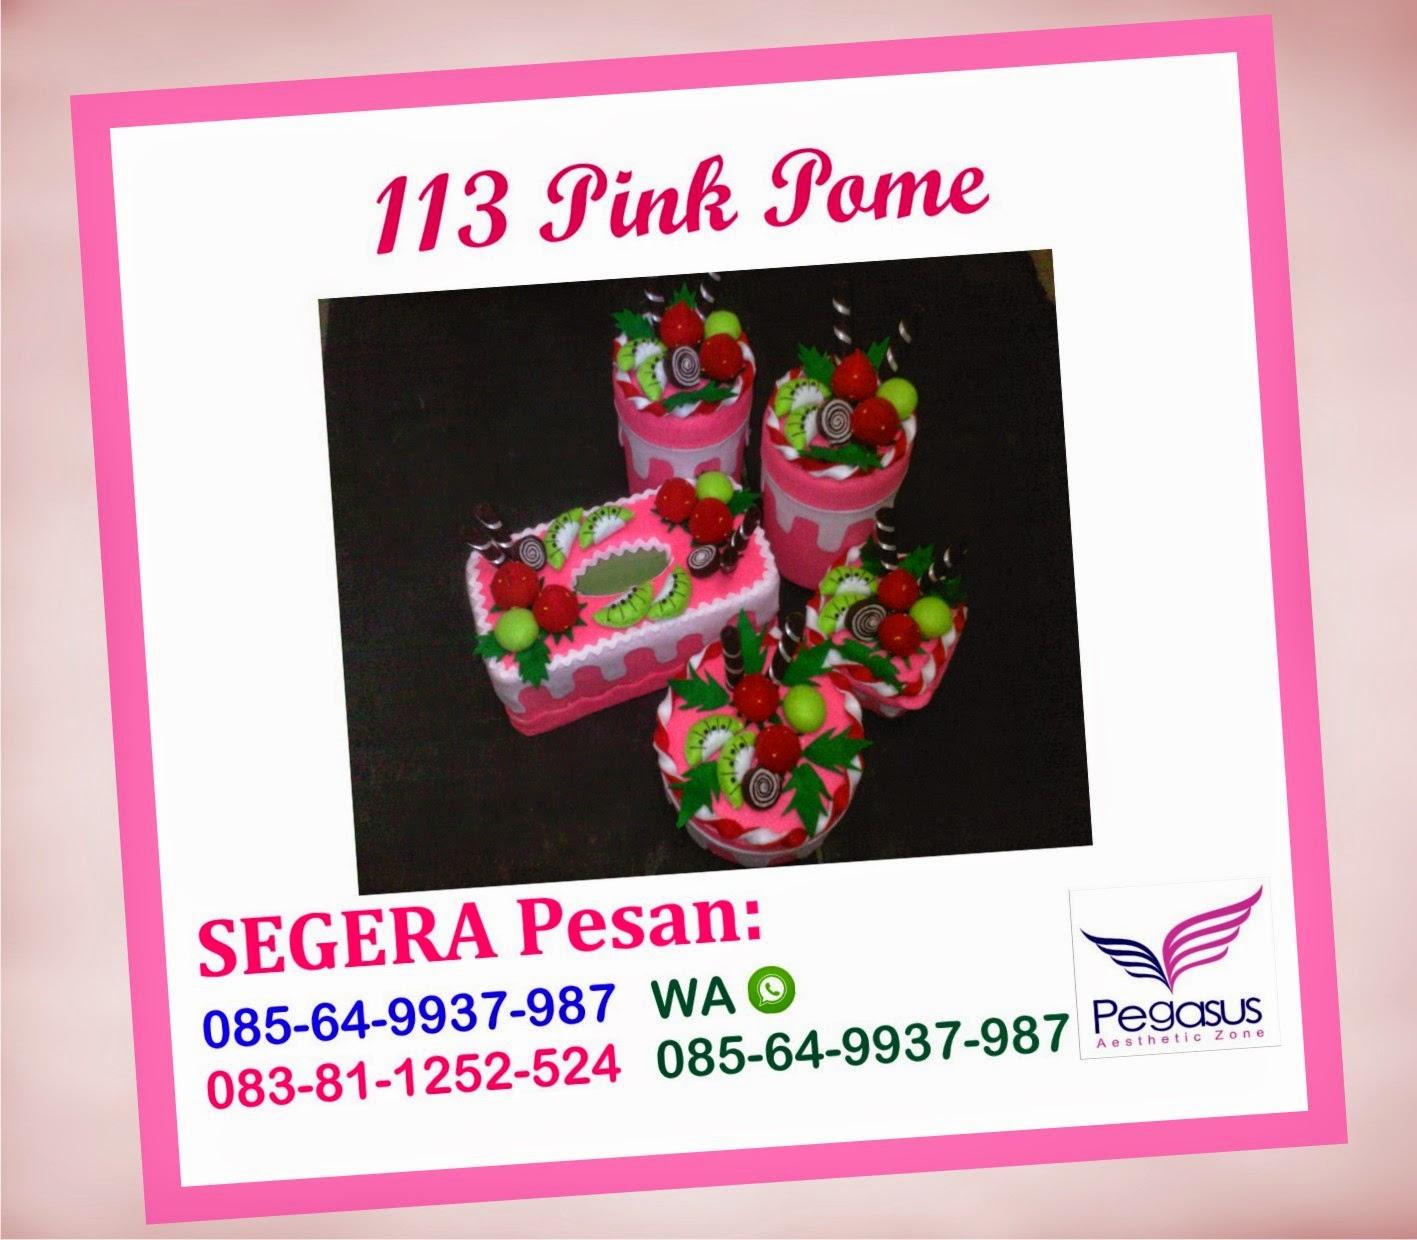 Toples Flannel, Souvenir Malang Pernikahan, Souvenir Malang Murah, +62.8564.993.7987